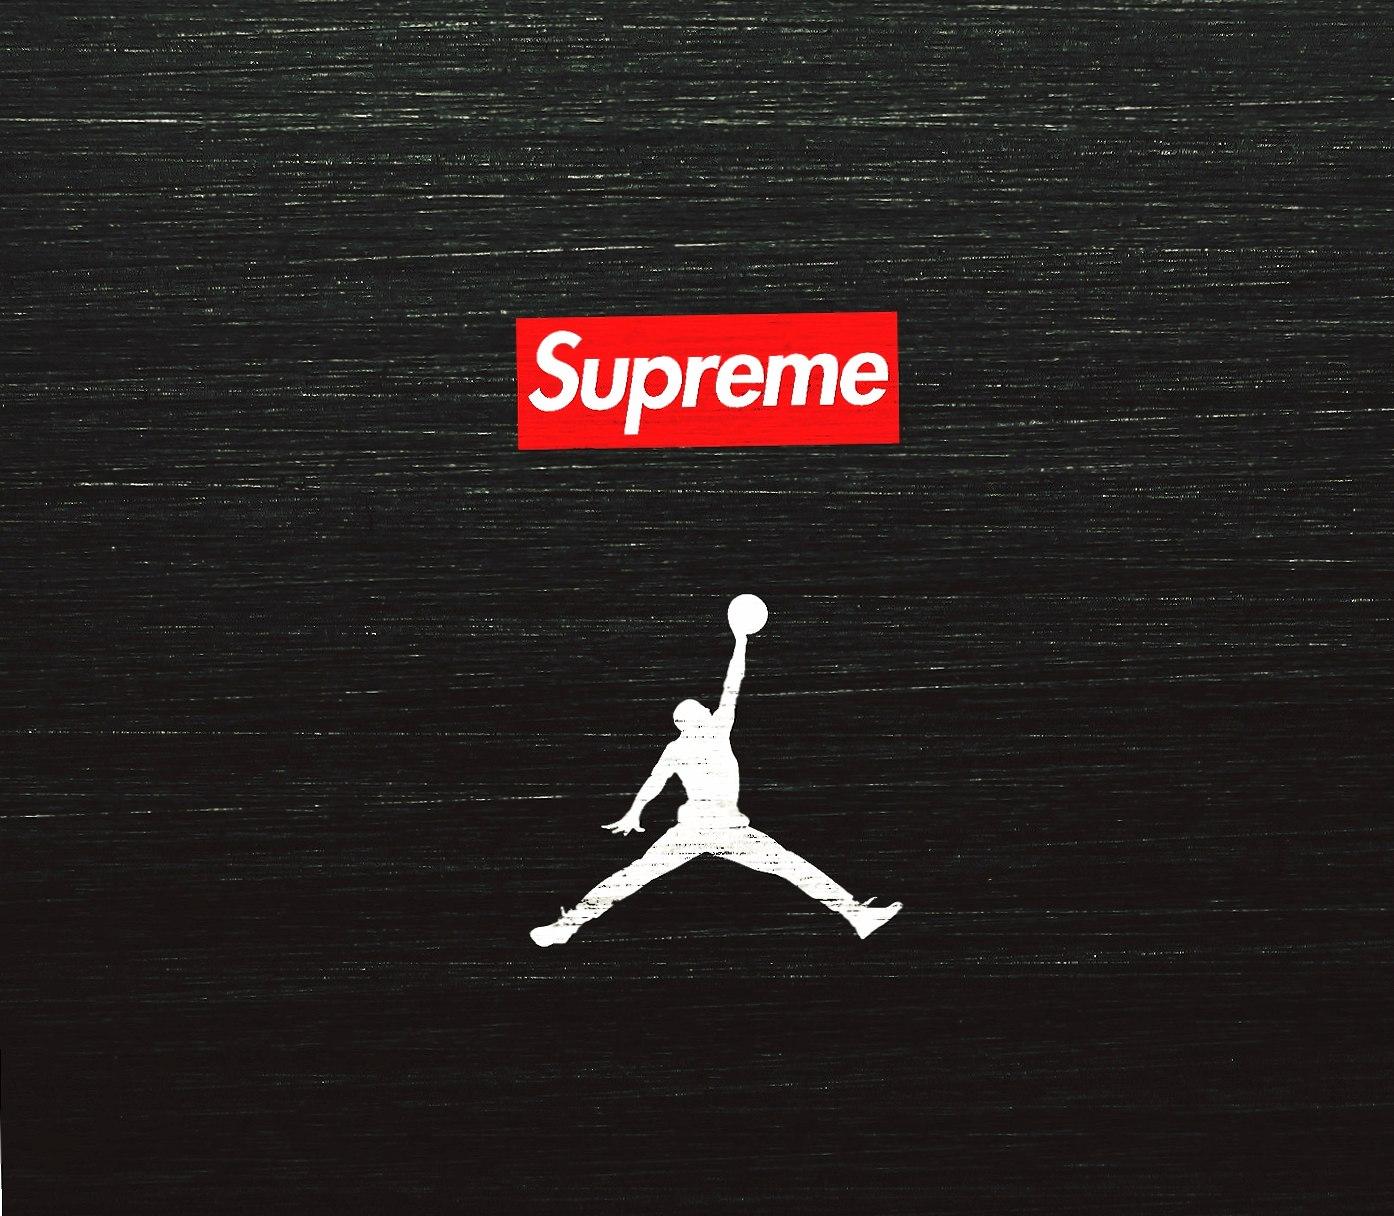 Supreme x Air Jordan wallpapers HD quality